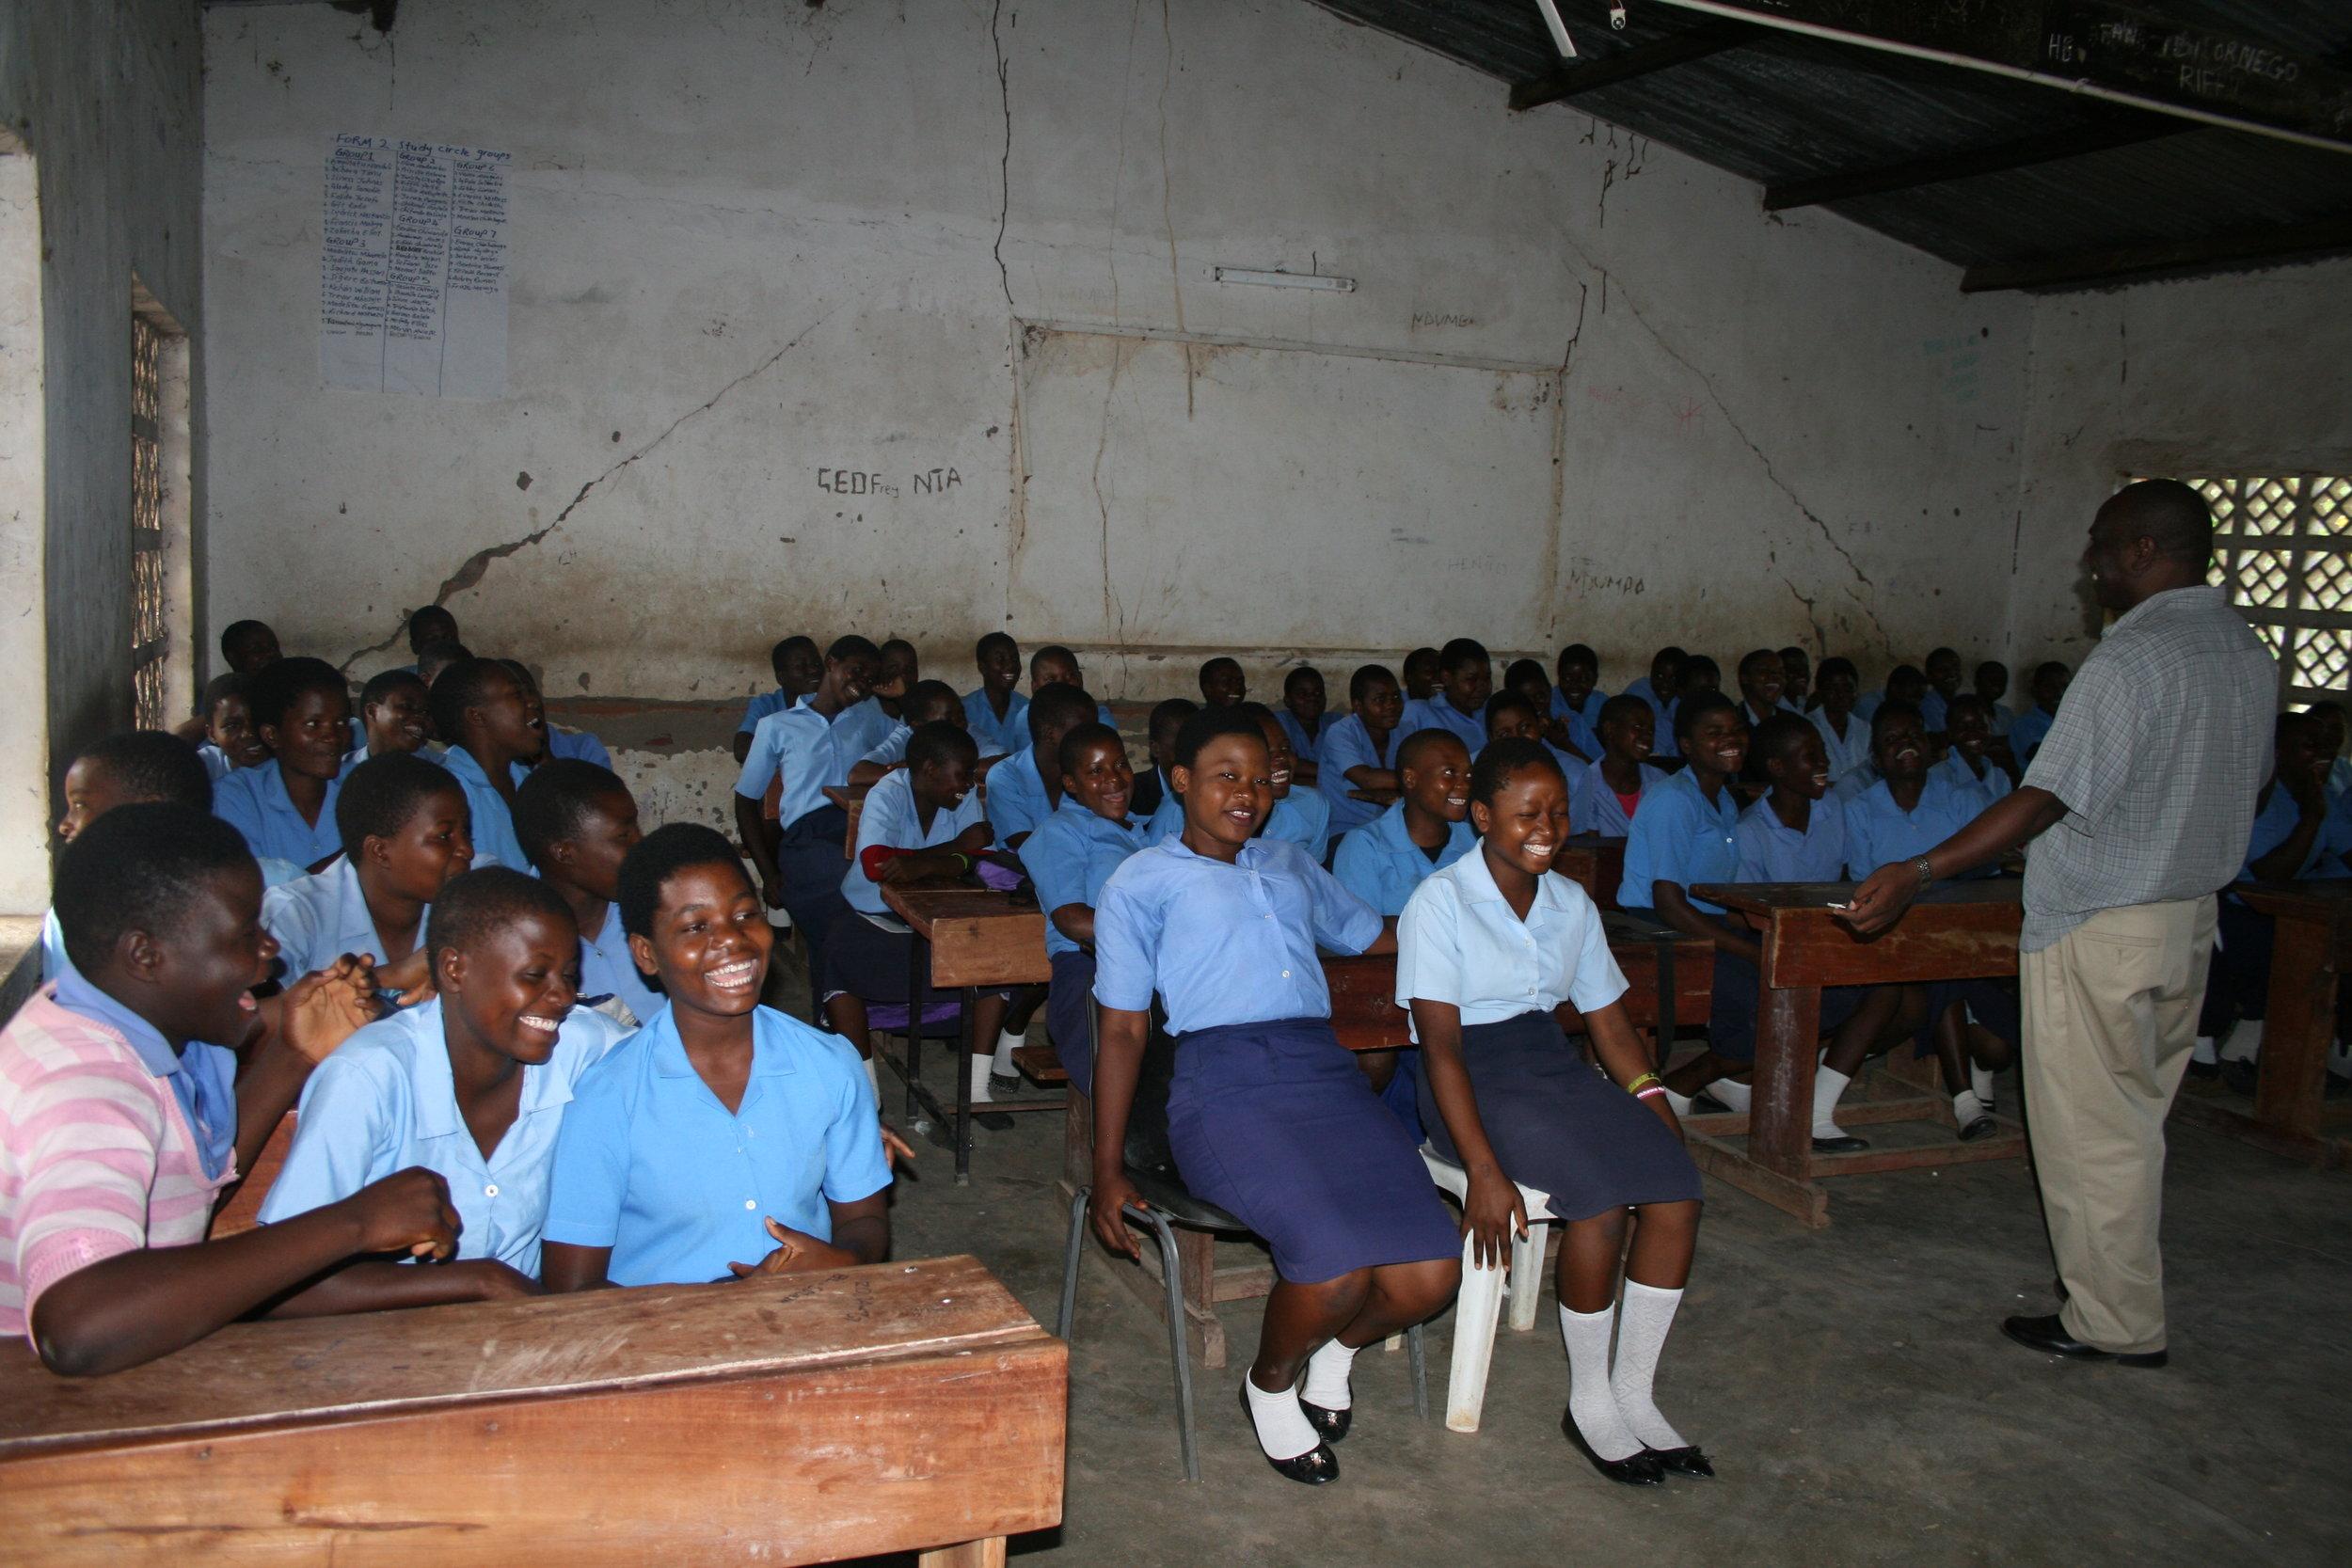 A classroom of girls giggle at Zikani's joke.